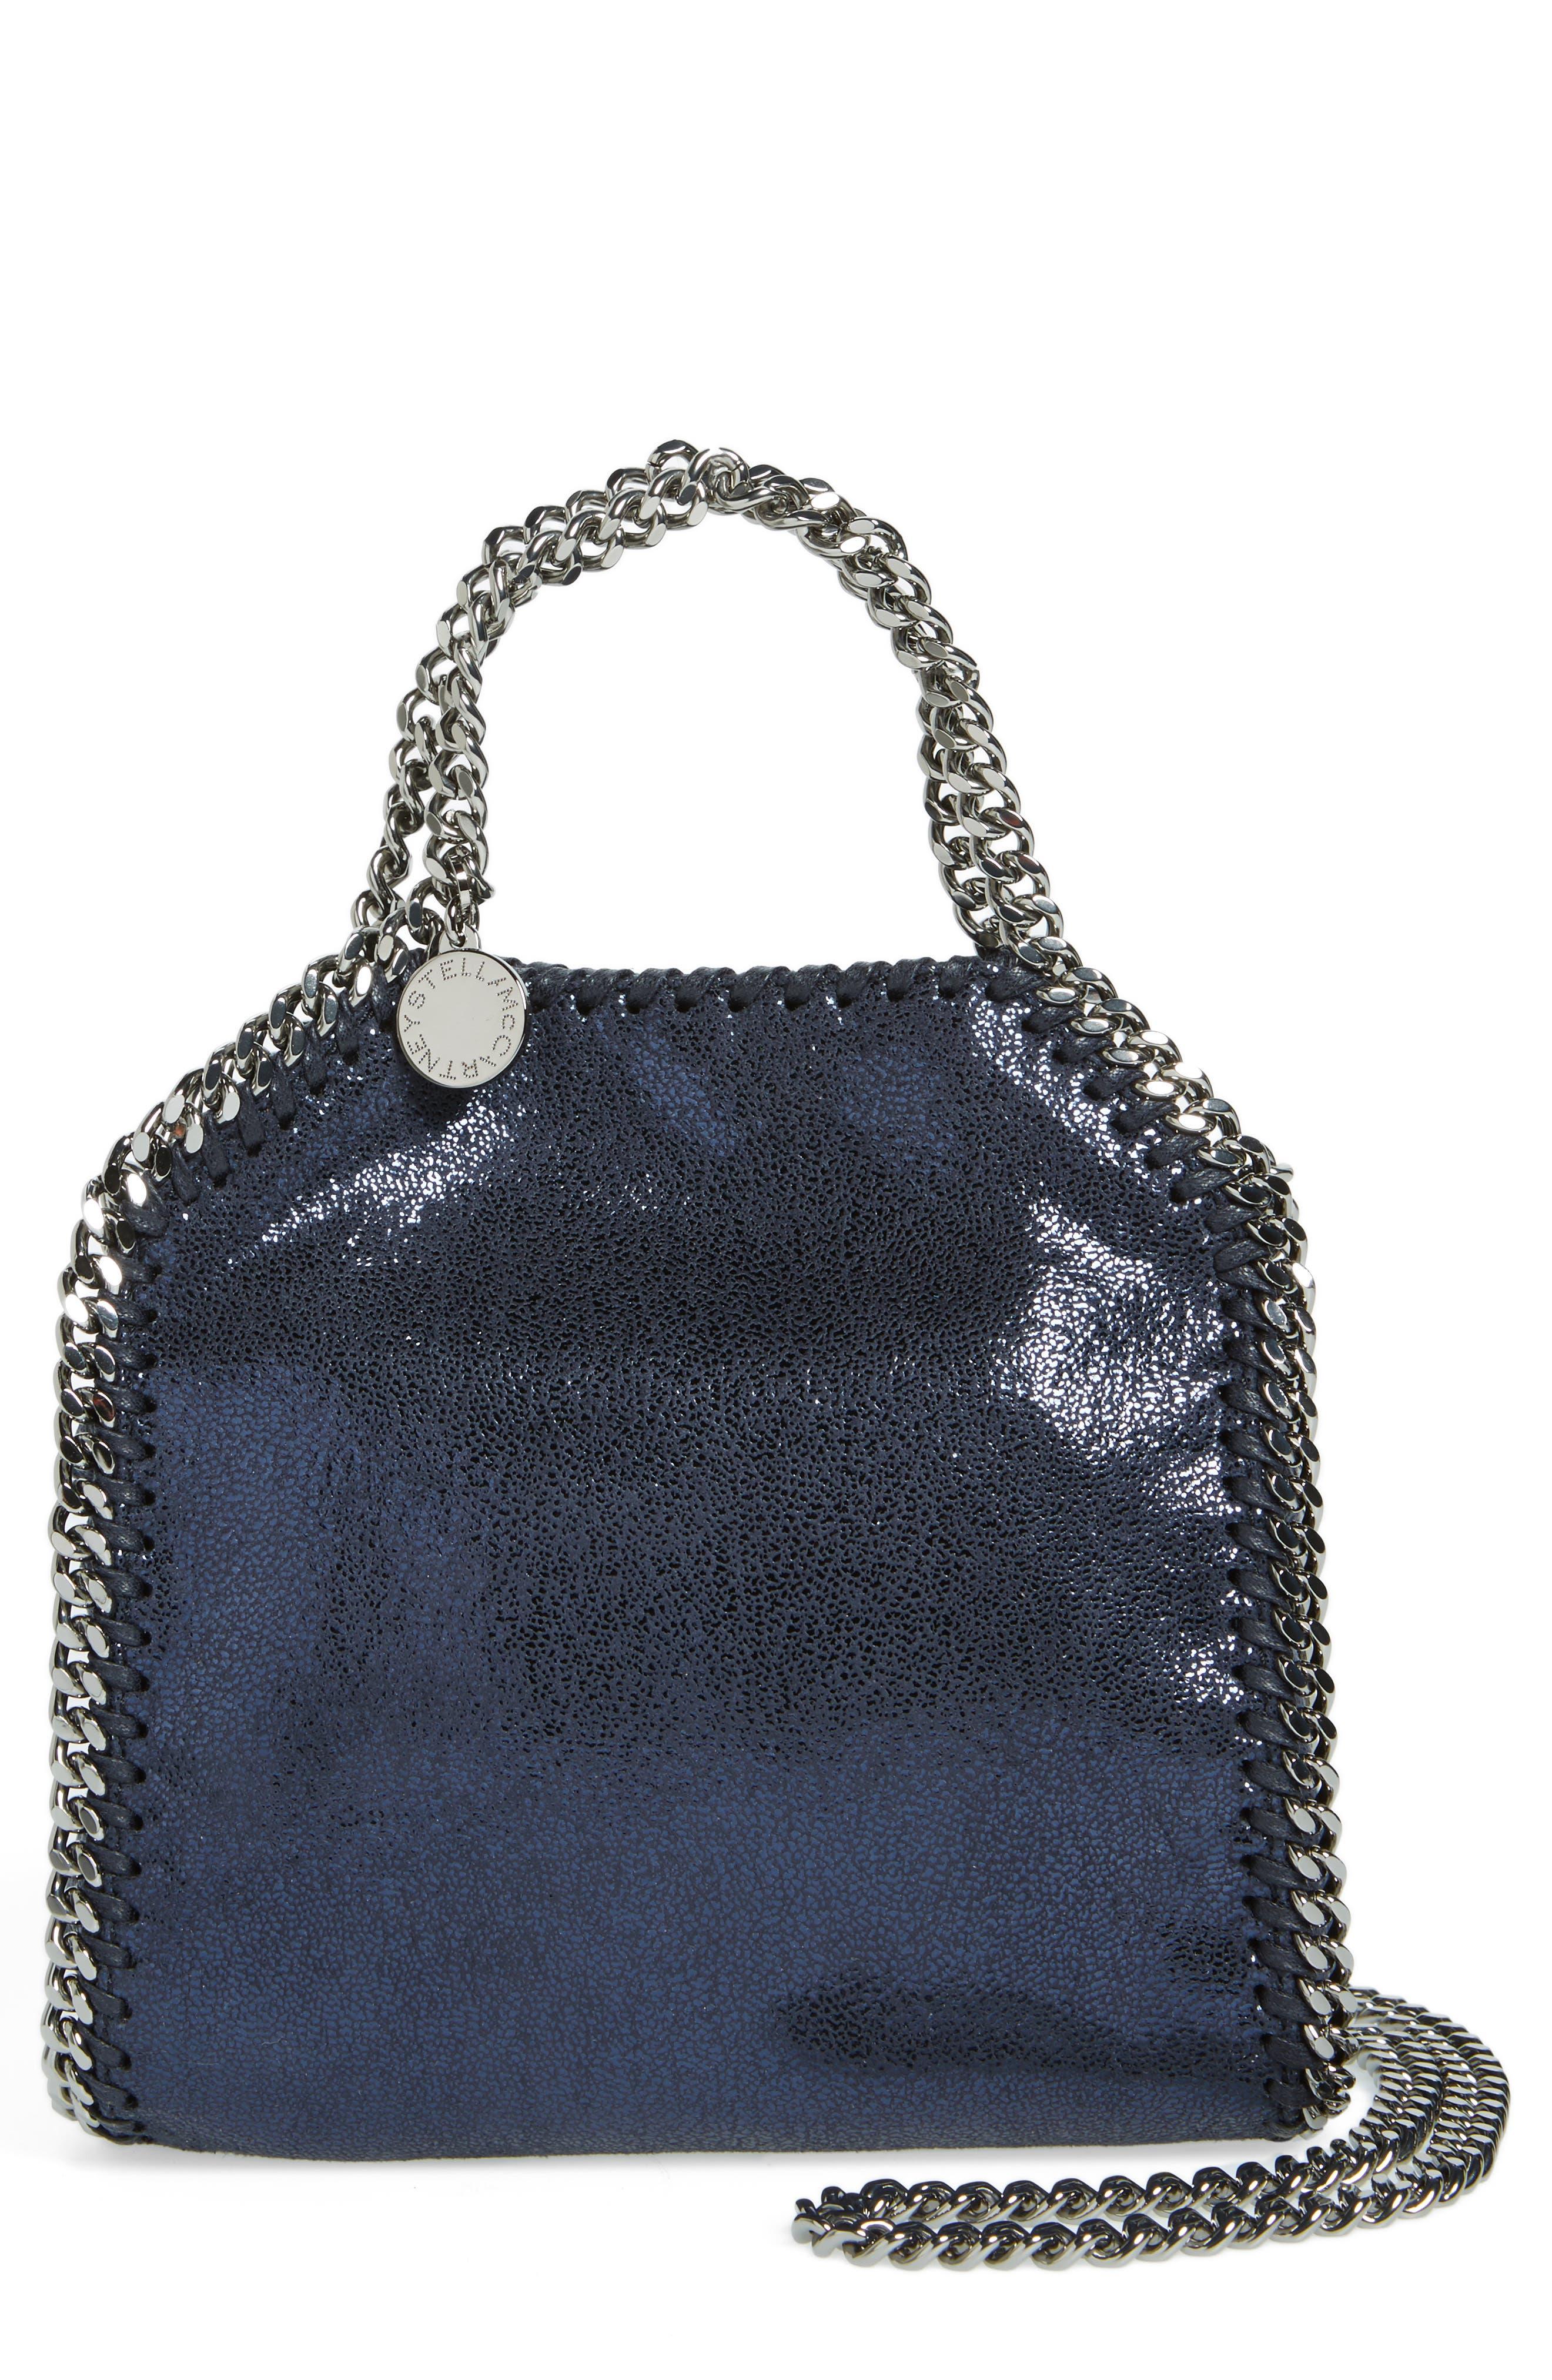 STELLA MCCARTNEY 'Tiny Falabella' Metallic Faux Leather Crossbody